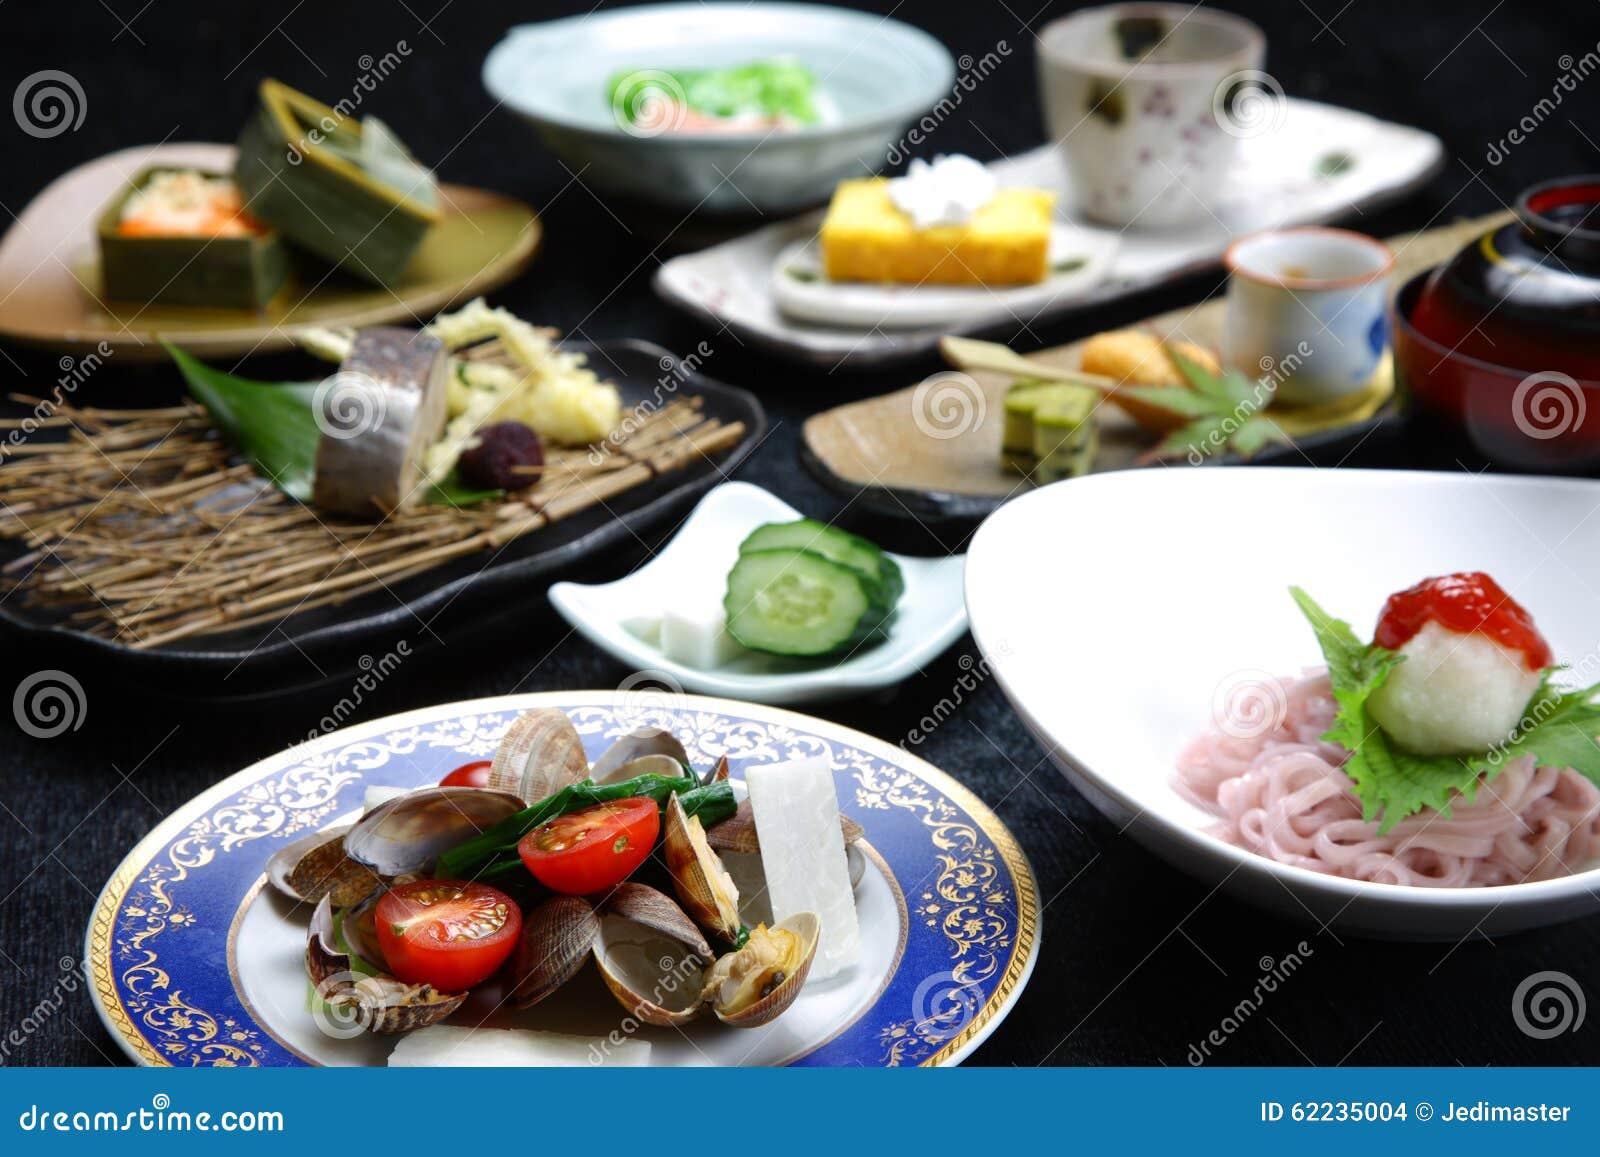 japanse keuken gezond